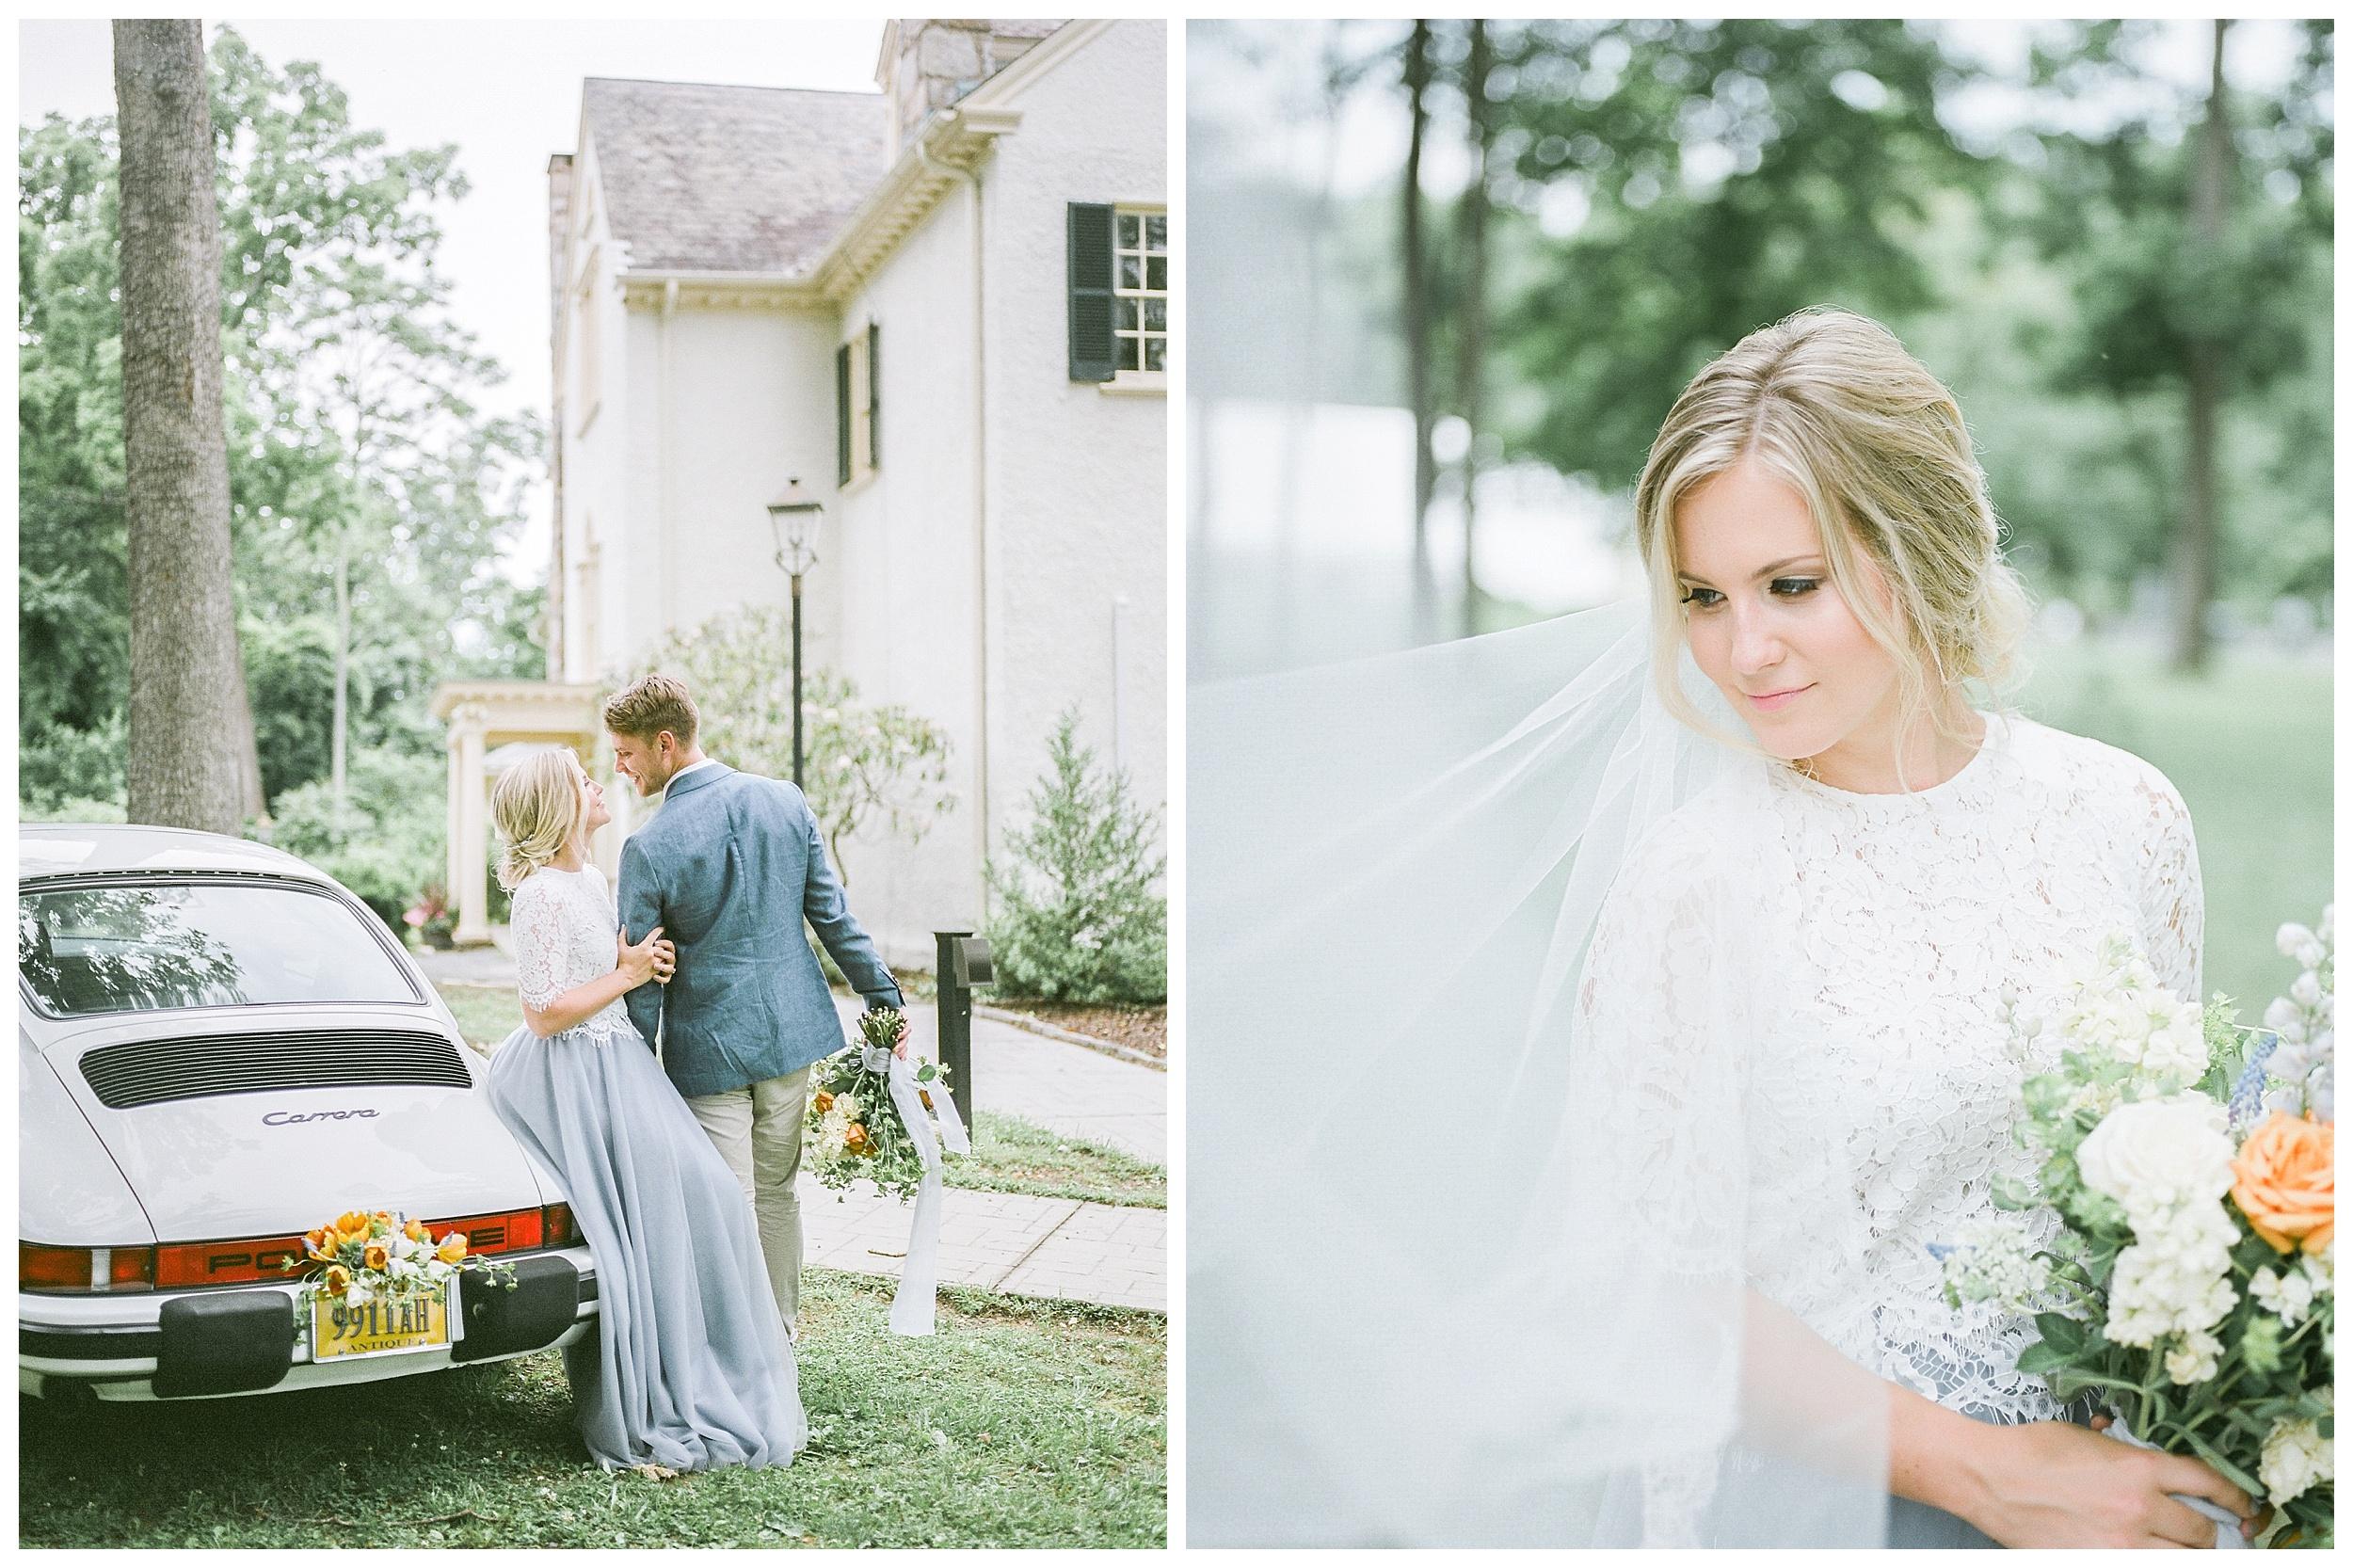 Rust Manor Wedding   Virginia Wedding Photographer Kir Tuben_0031.jpg